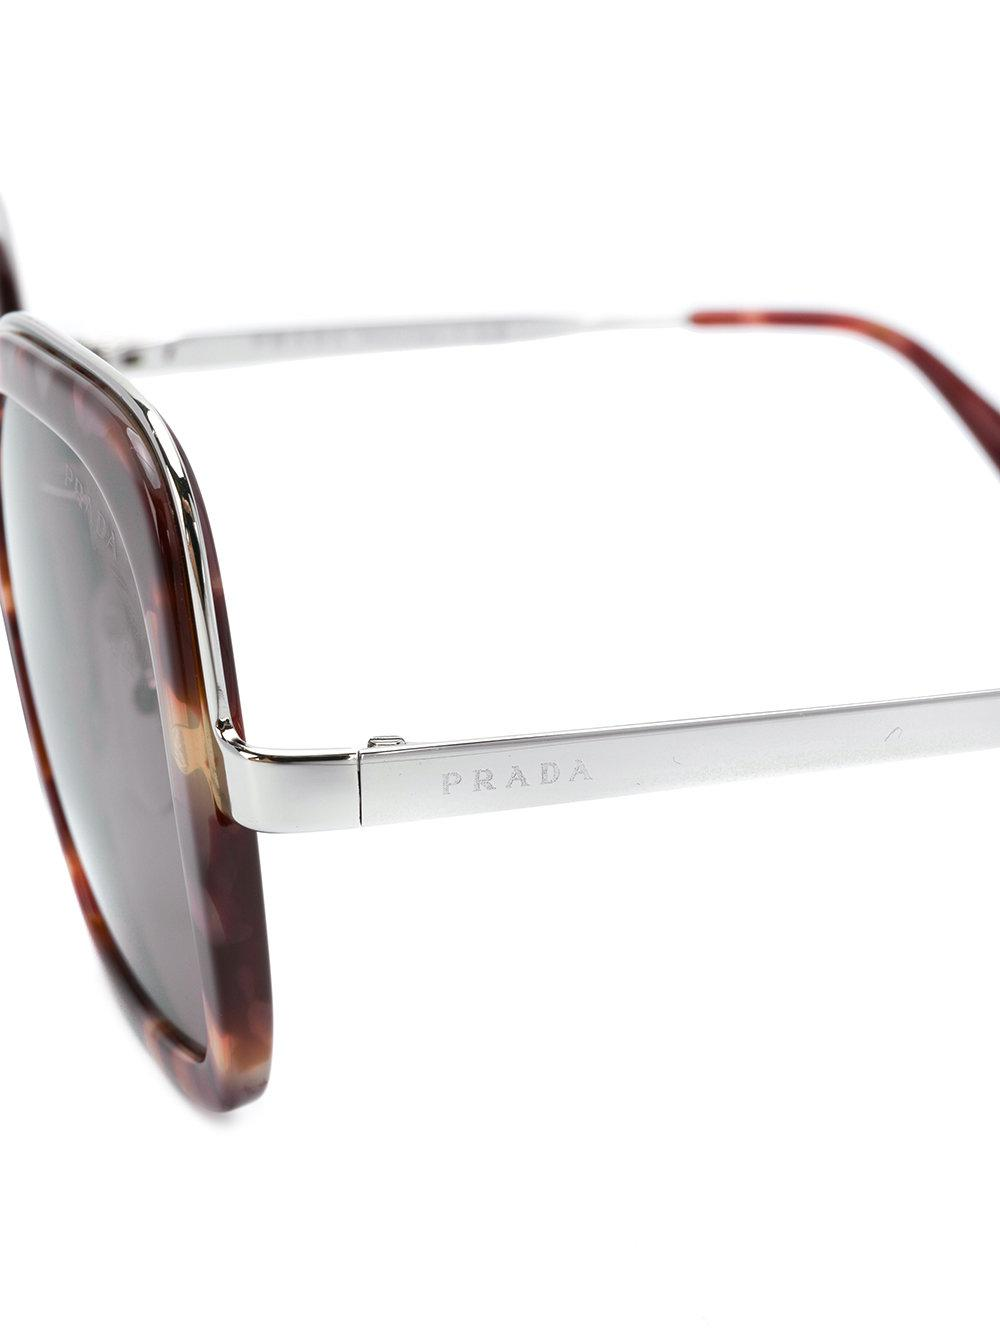 260988261b Lyst - Prada Tortoiseshell-effect Cinema Square-frame Sunglasses